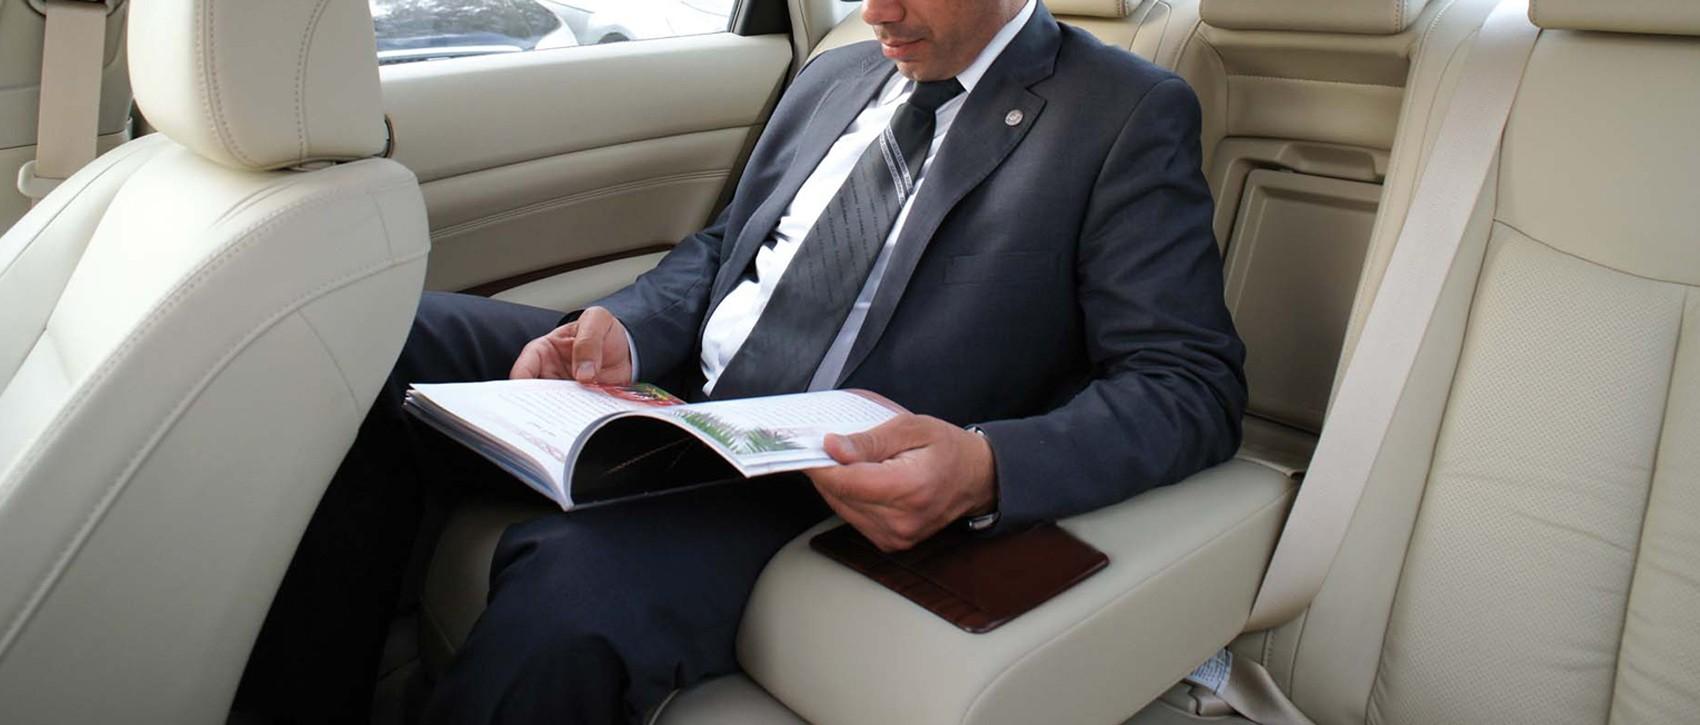 Hyatt Chauffeured Vehicles Pty Ltd